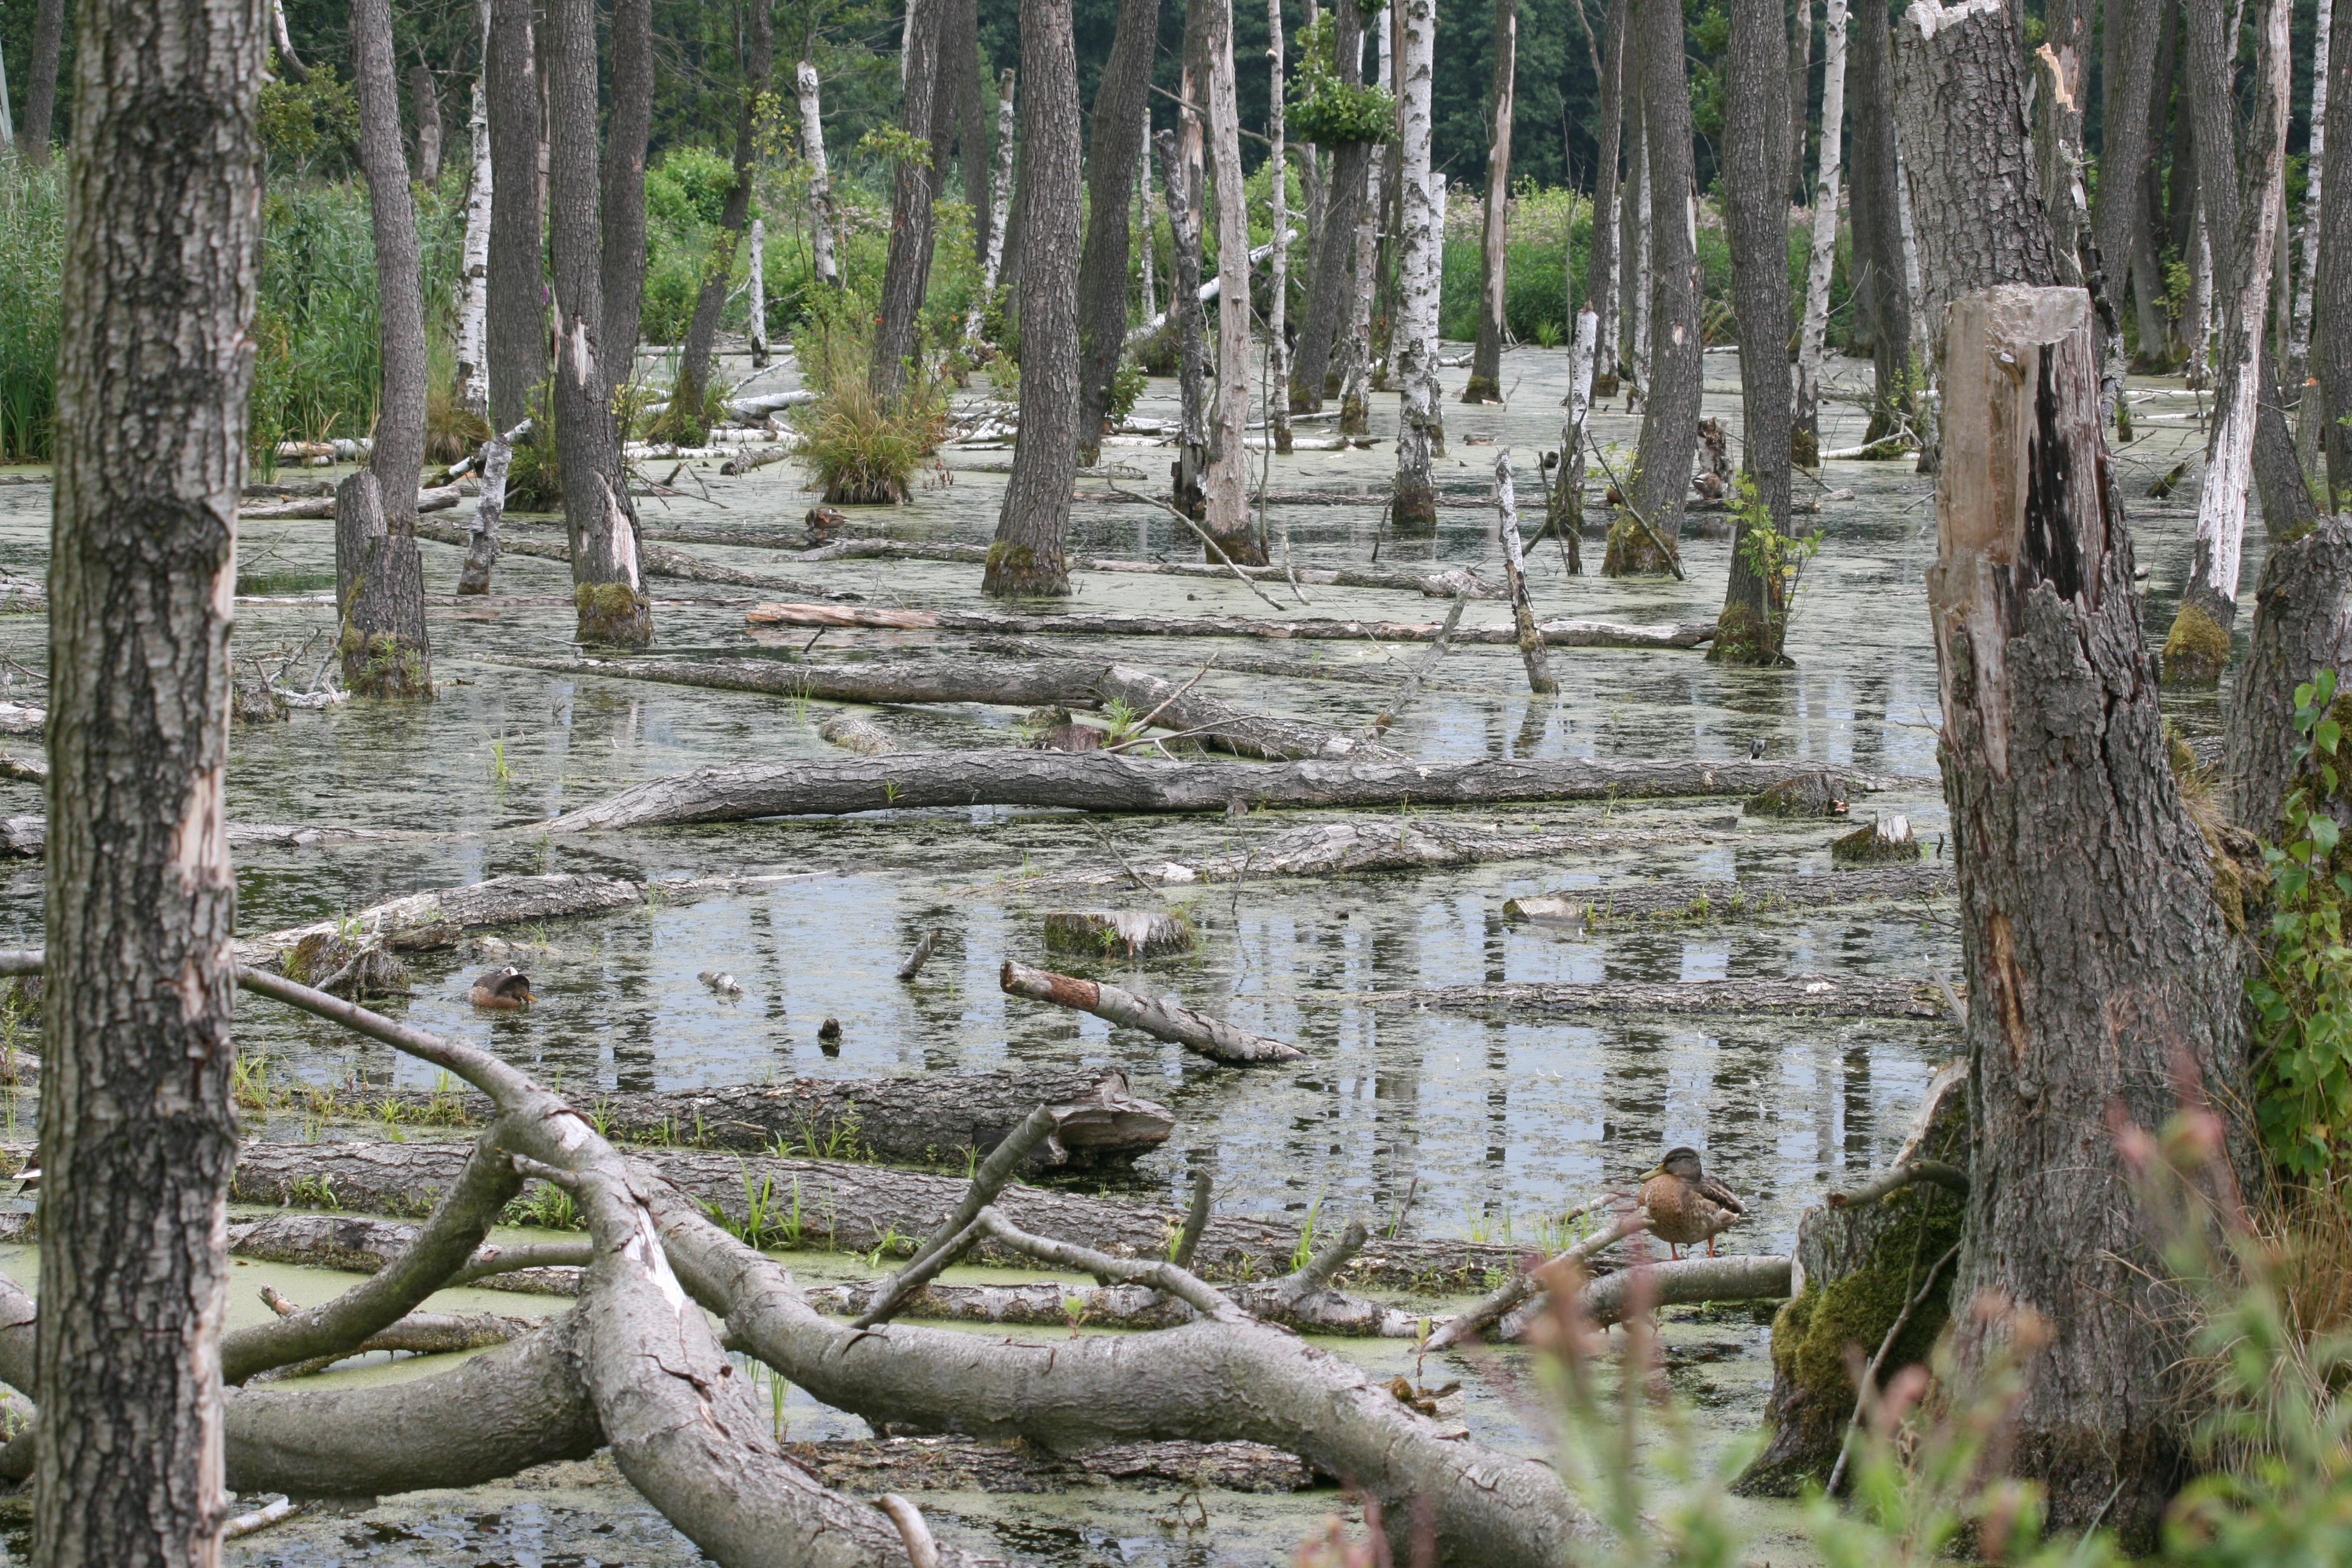 Müritz-Sumpf im Wald - Quelle: Wikimedia